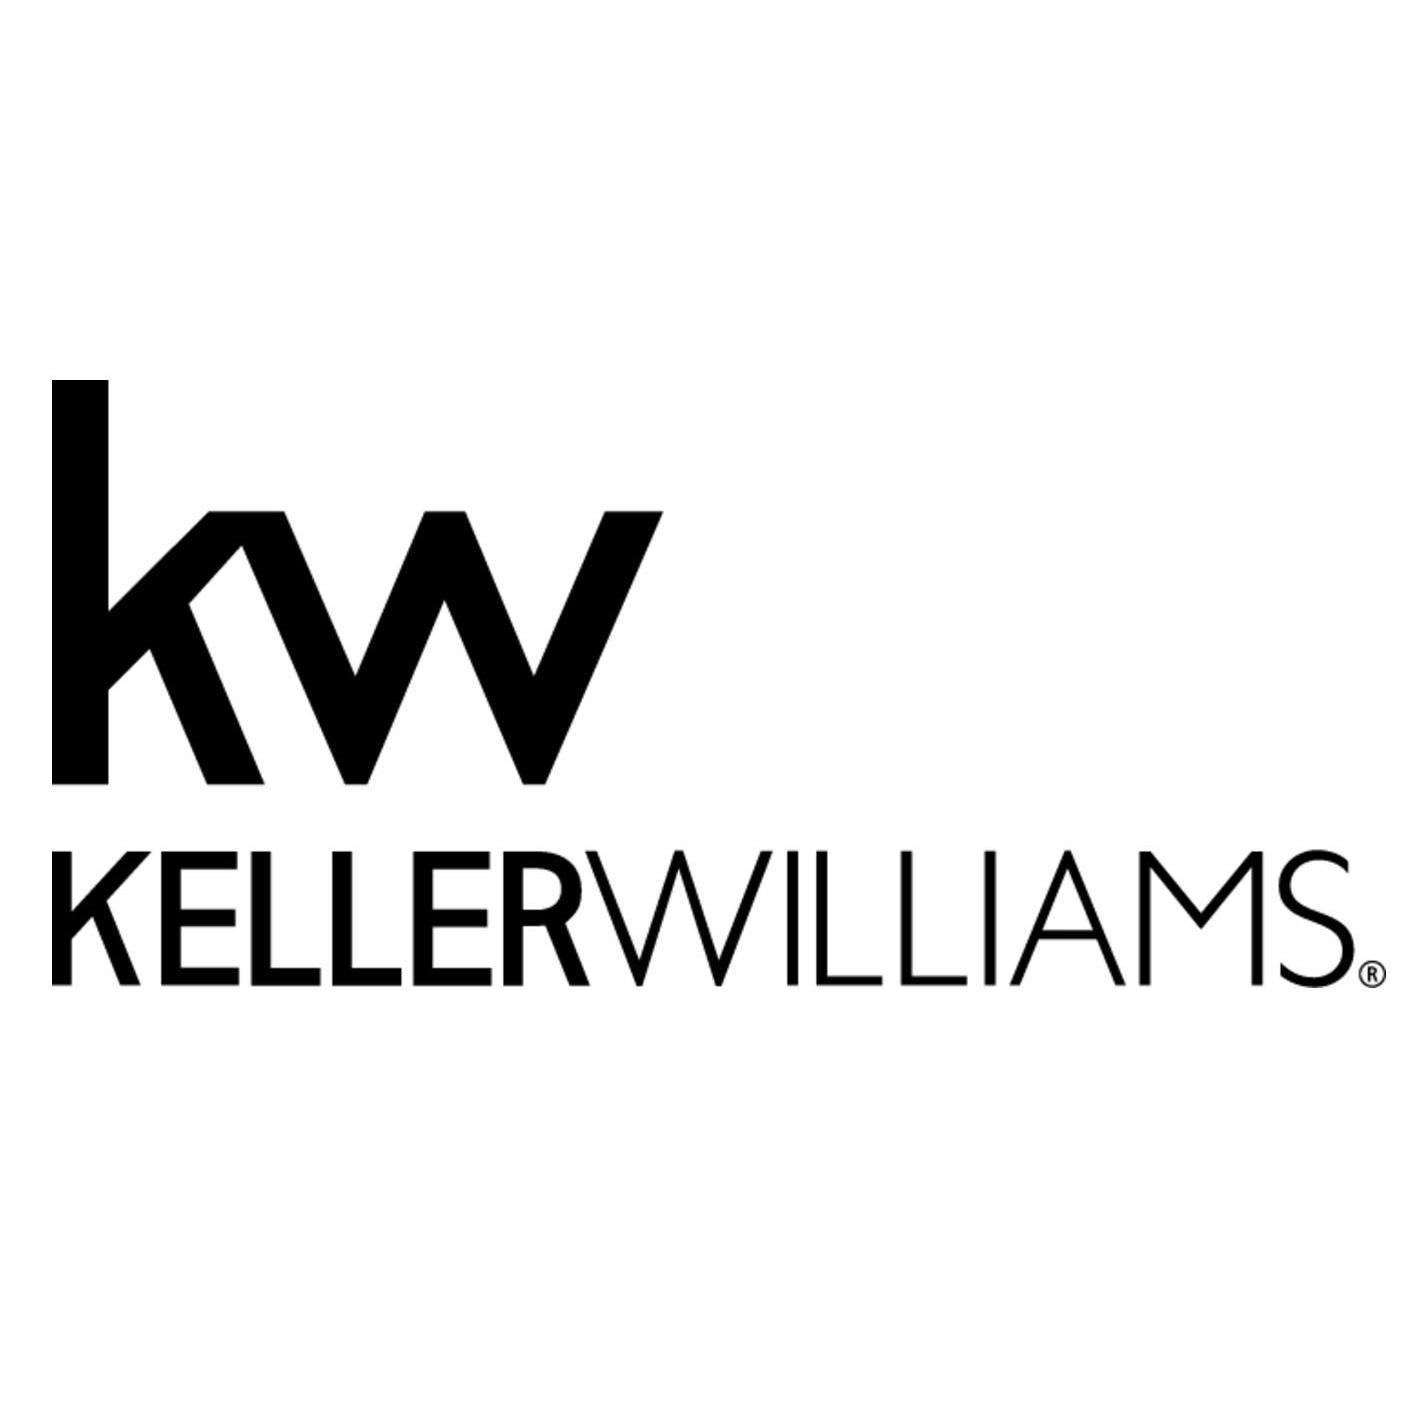 Stephanie Arbolida | Keller Williams South Bay image 0